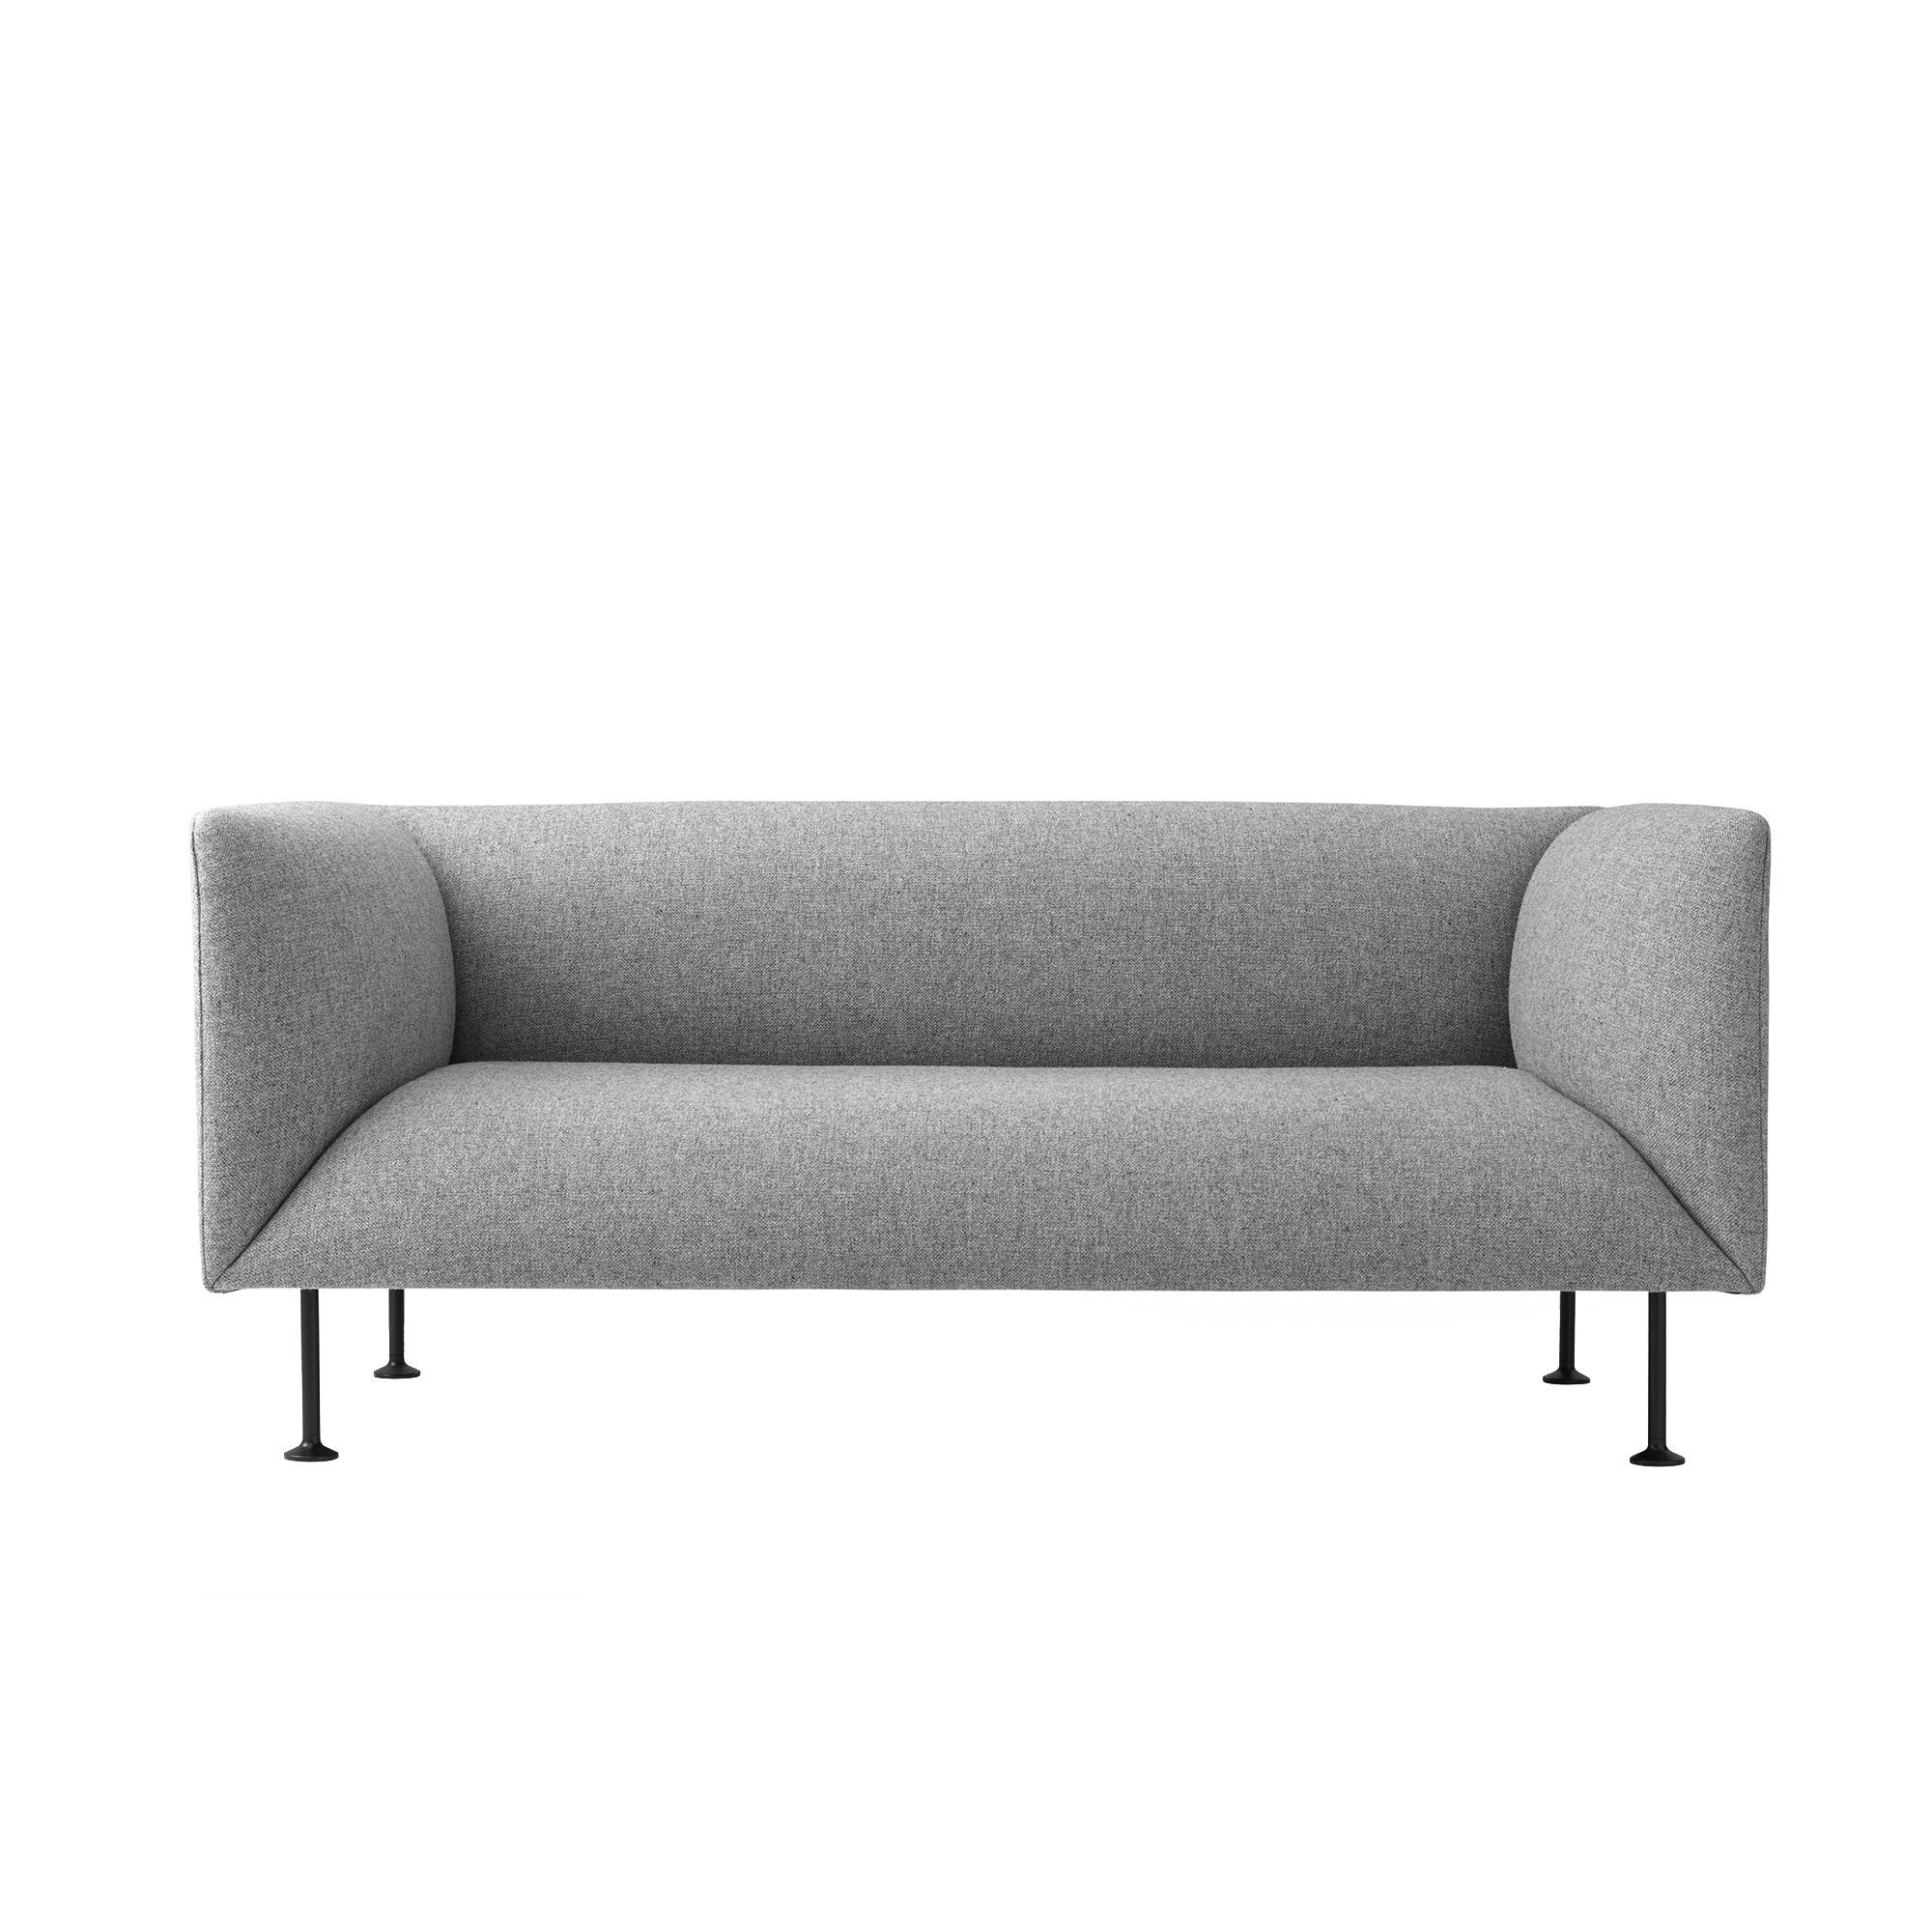 Menu   Godot Sofa 2 Seater   Grey Melange/powder ...